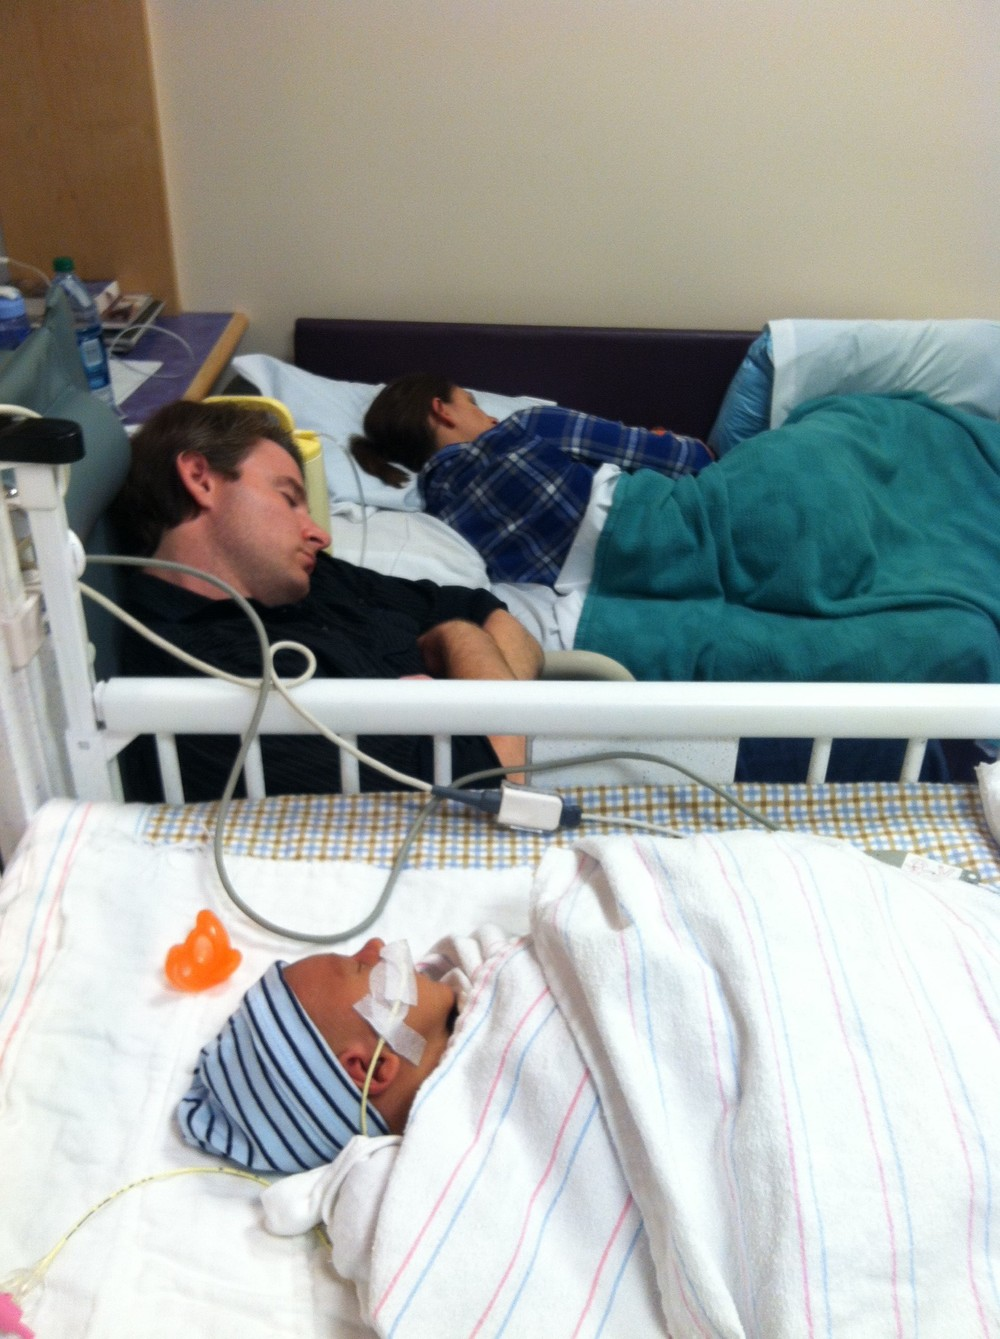 hospital snooze mybwsbaby.com